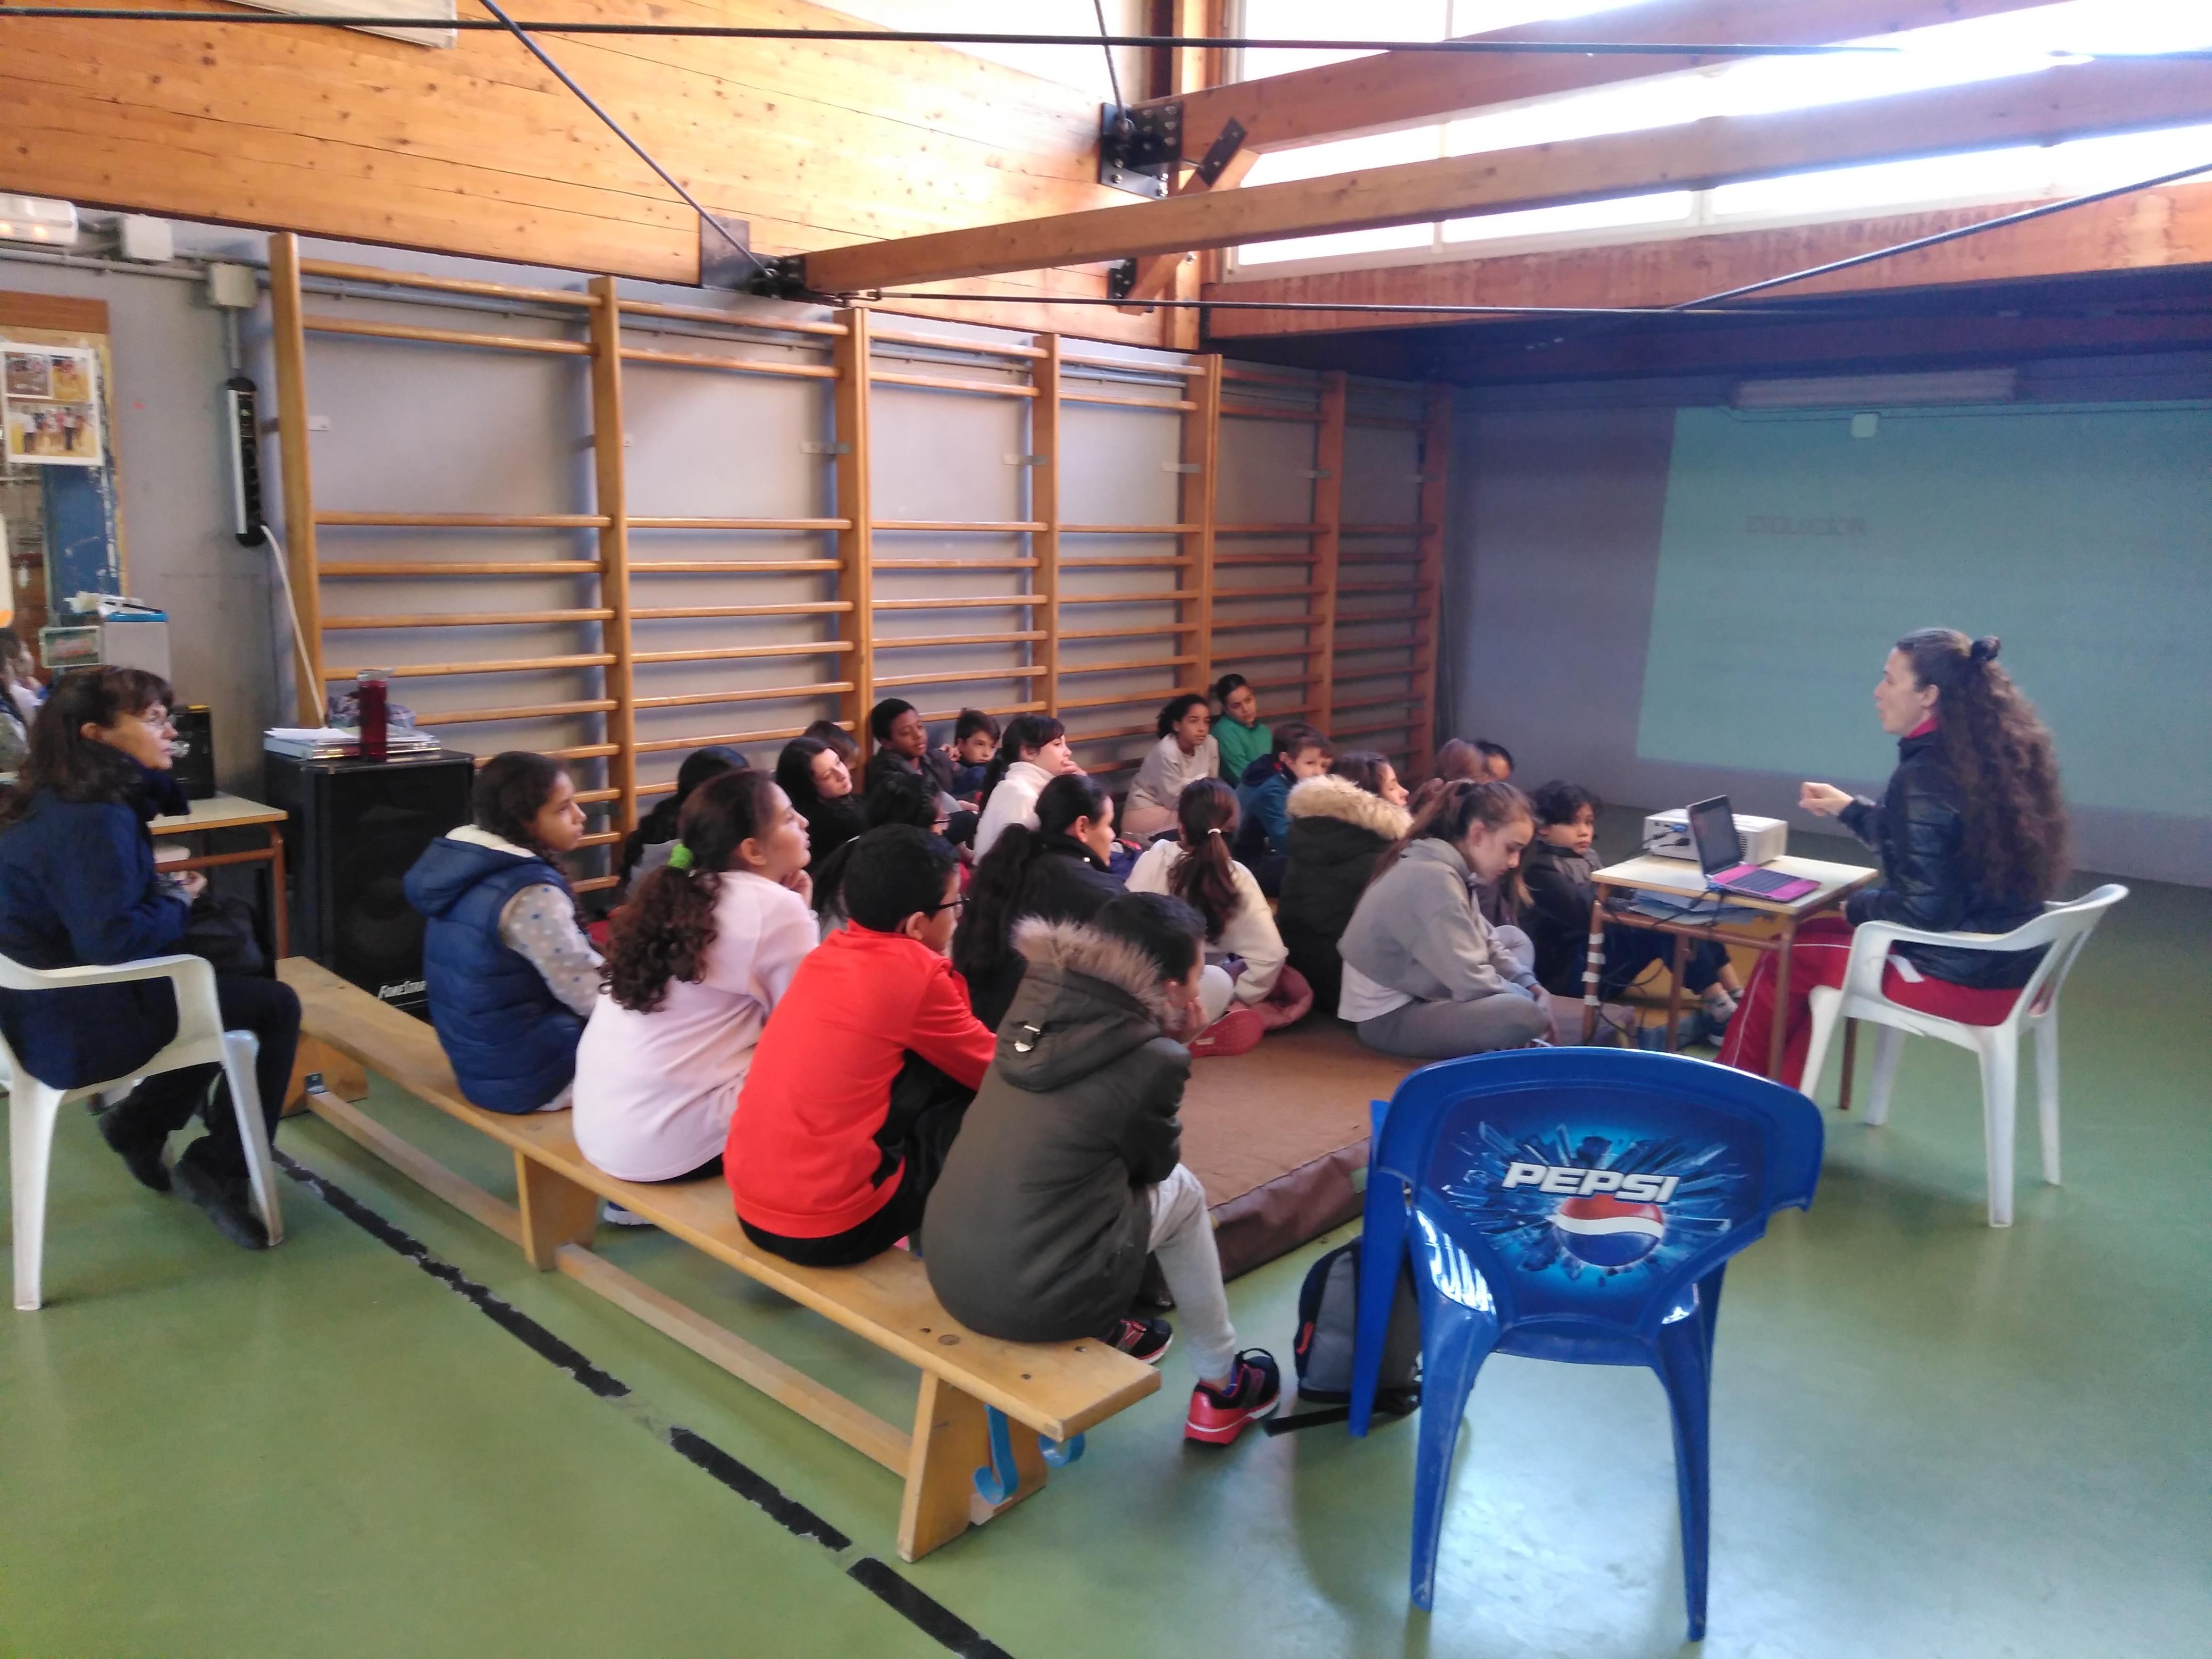 Gimnasia de trampolín 3 15